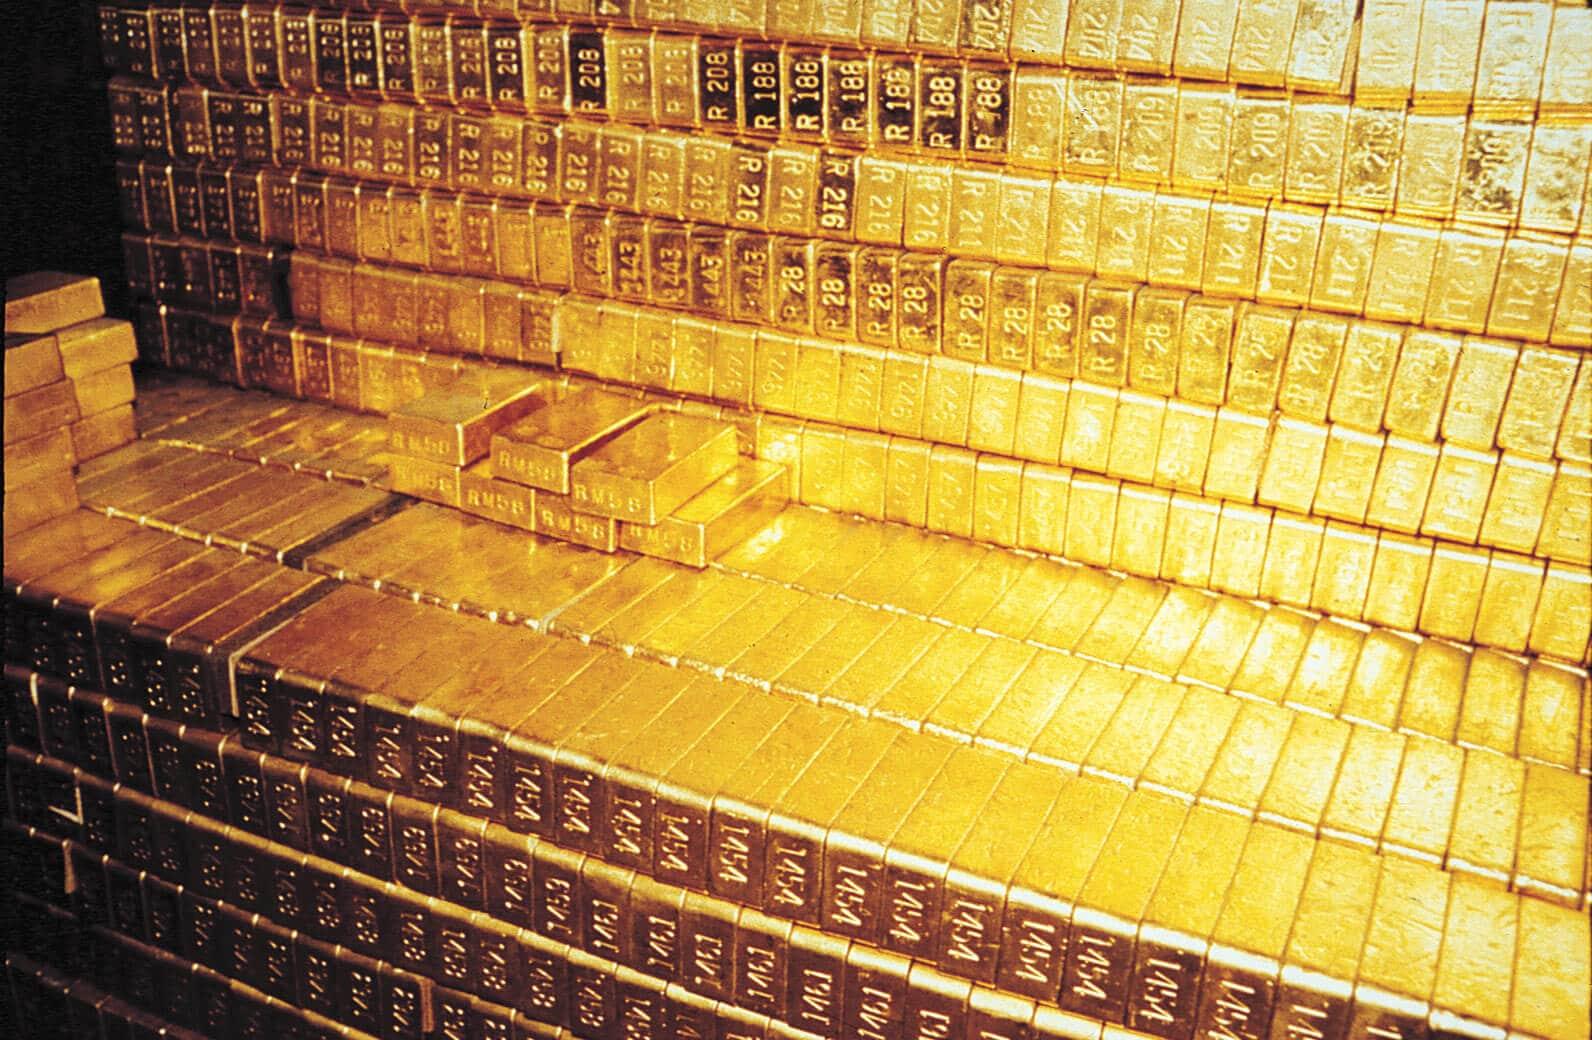 Le Musée de la Federal Reserve Bank of New York